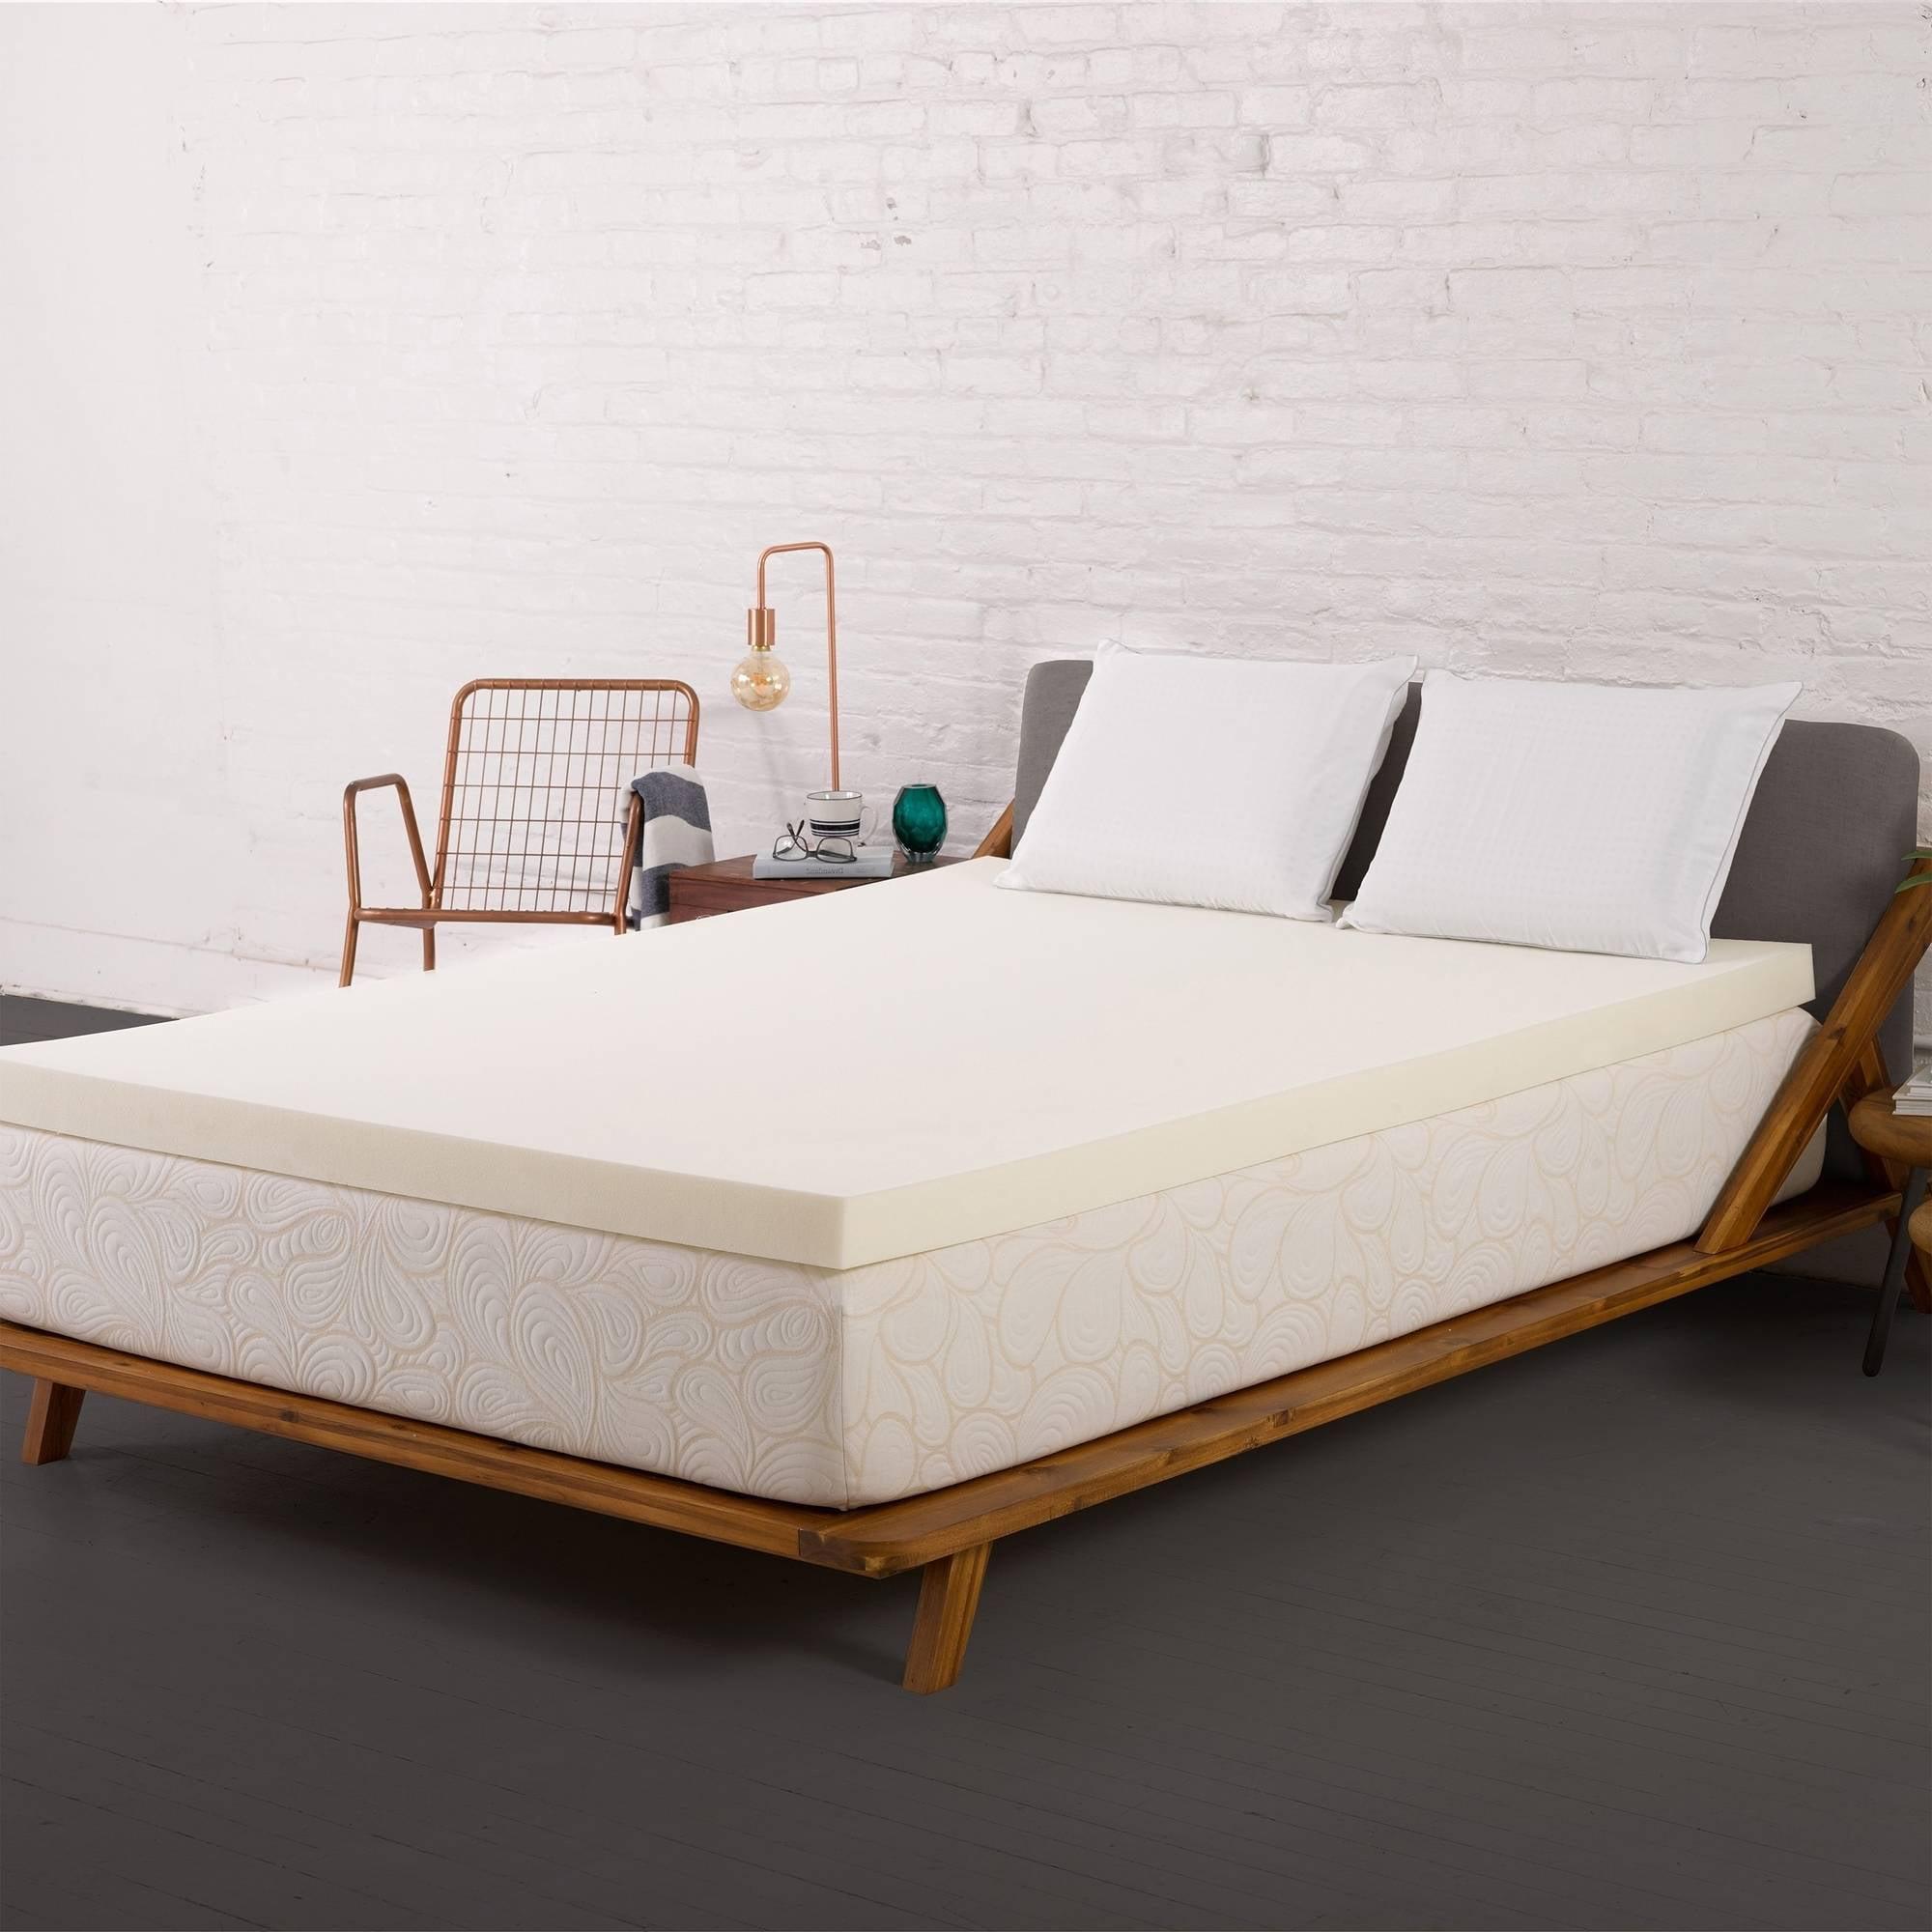 Authentic Comfort 2-Inch Memory Foam Mattress Topper by Sleep Studio, LLC